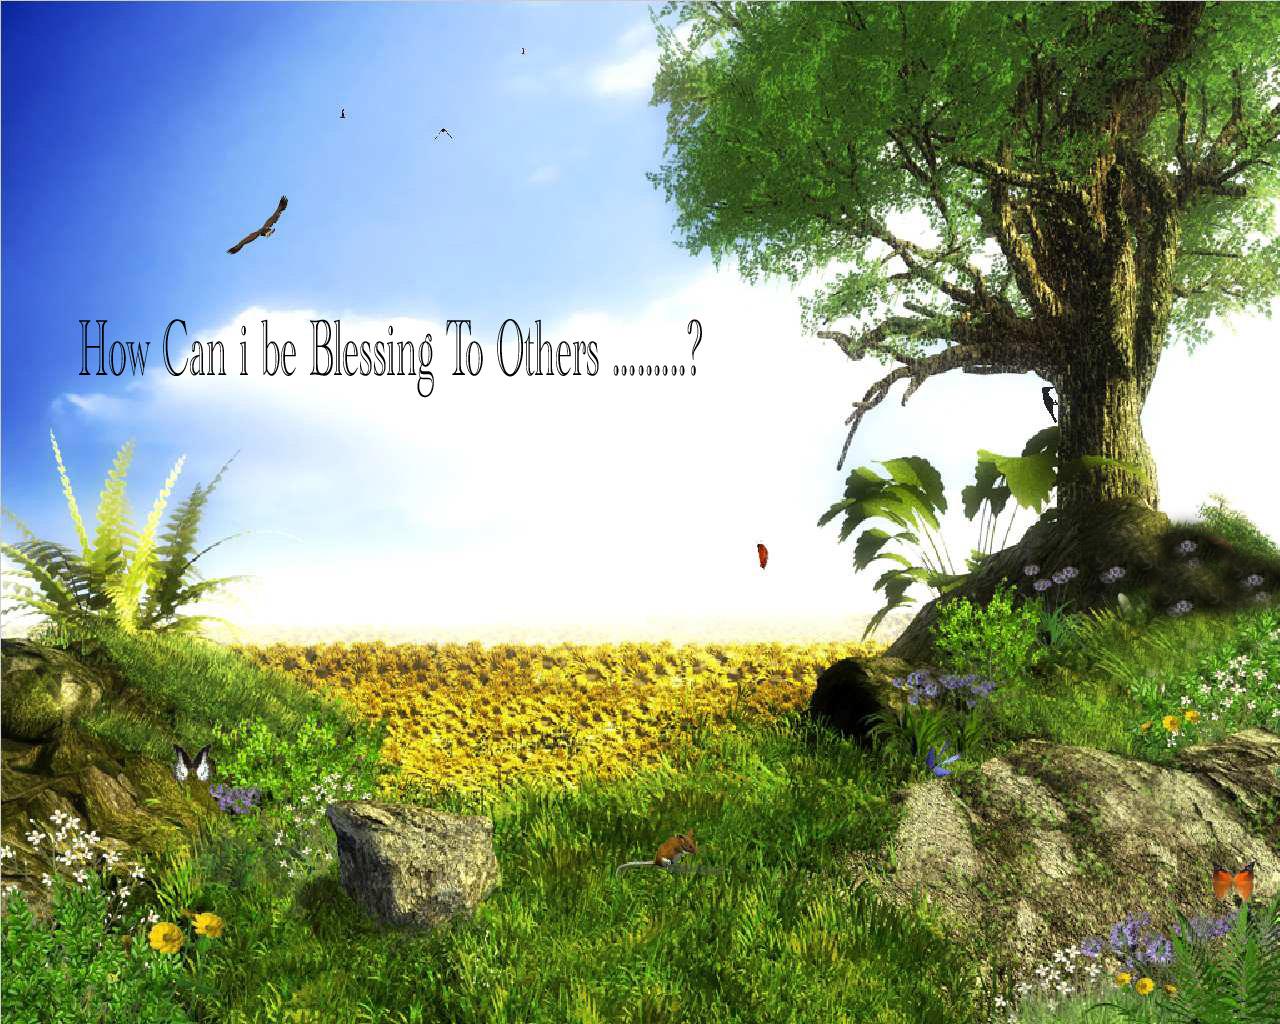 http://2.bp.blogspot.com/-K7thvZCWmc8/Tz4NXgi4k-I/AAAAAAAAAfs/fAvPEGiqPyU/s1600/wallpaper_islamic_quotes.jpg